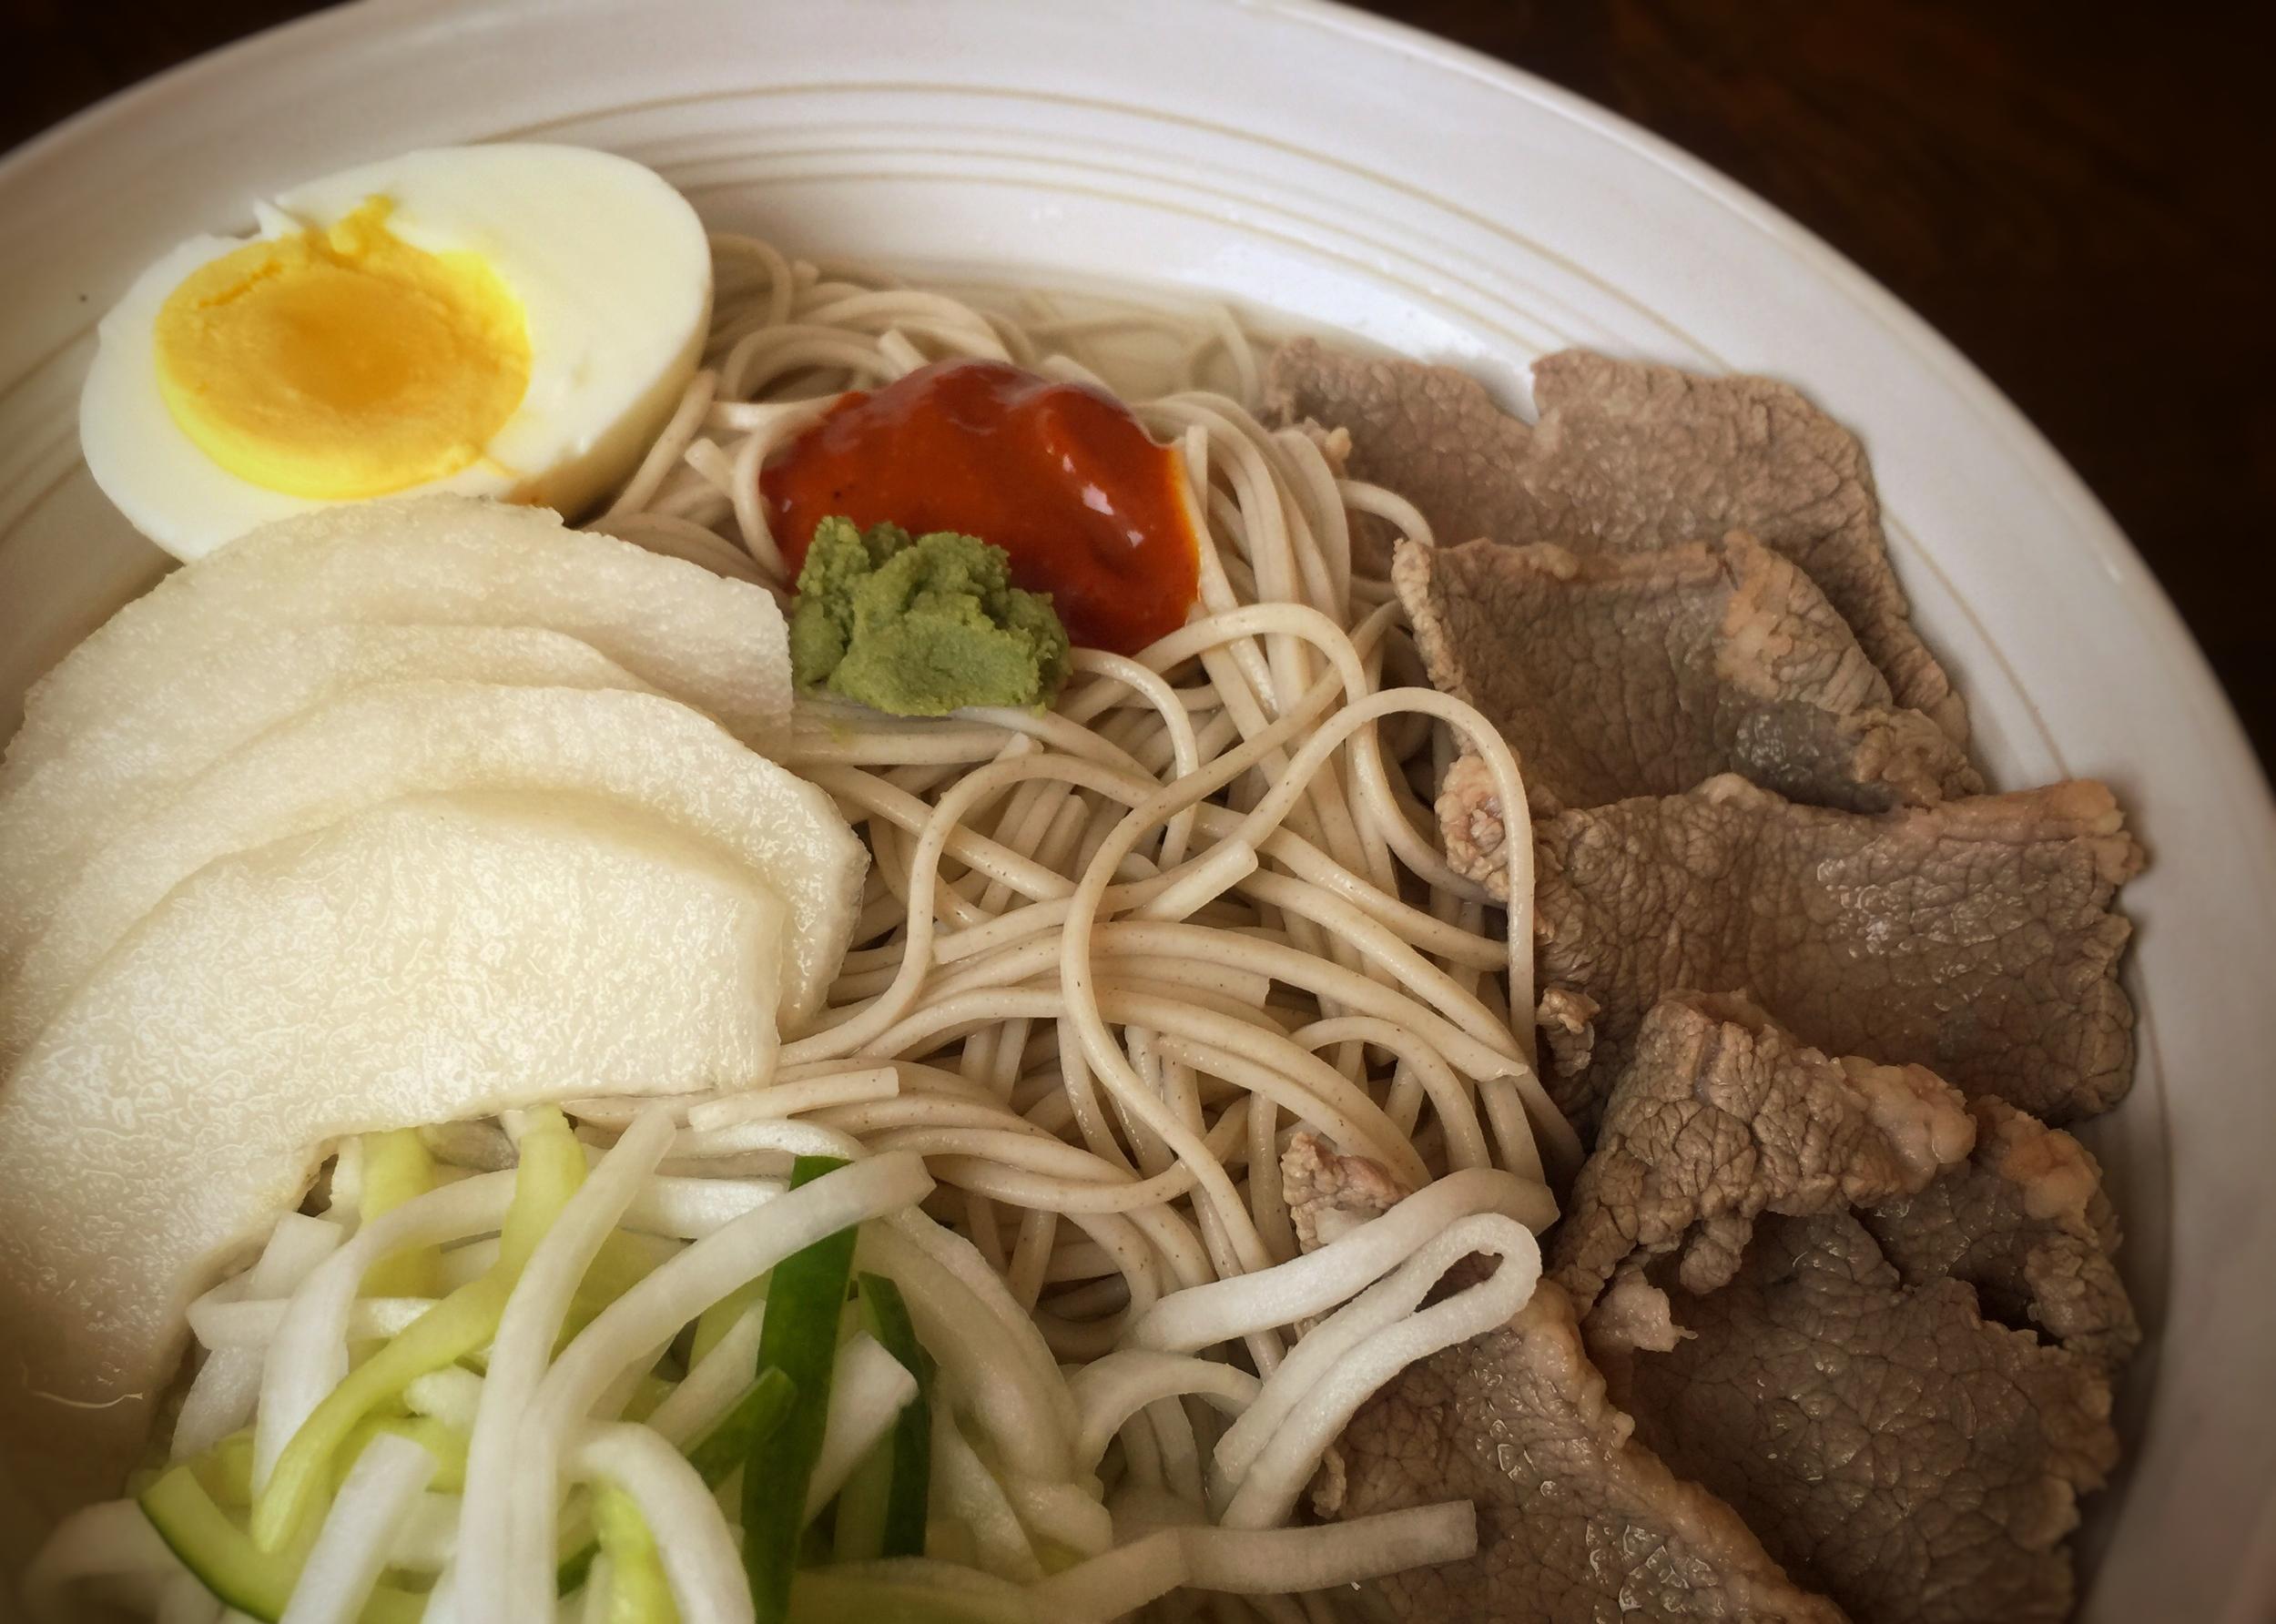 Korean cold buckwheat noodles with brisket